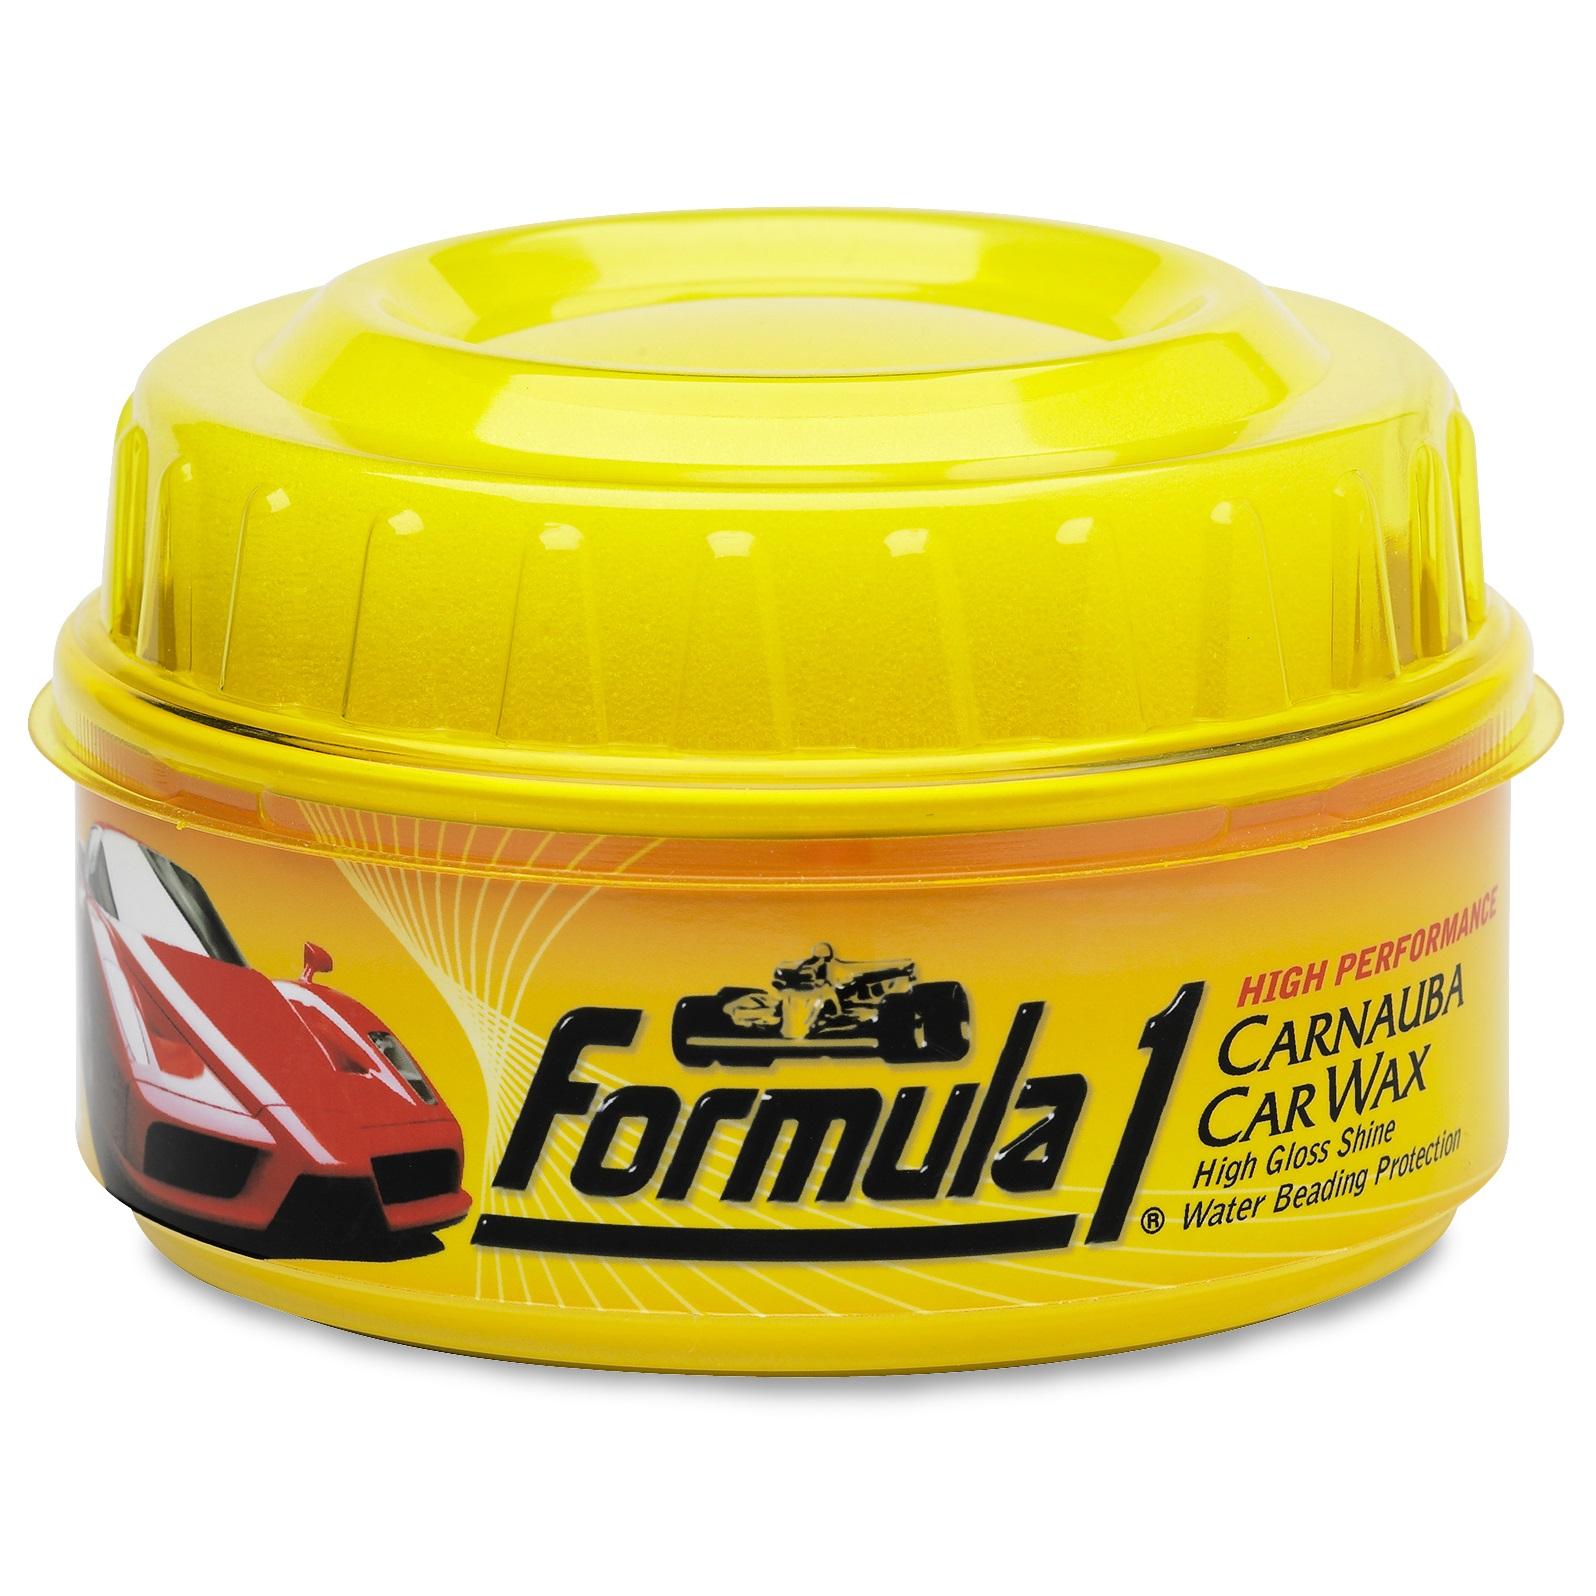 Formula 1 Carnauba Wax Car High Gloss Shine Polish No Water Beading Carb Jet Soft99 Made In Japan Sentinel Scratch 340g